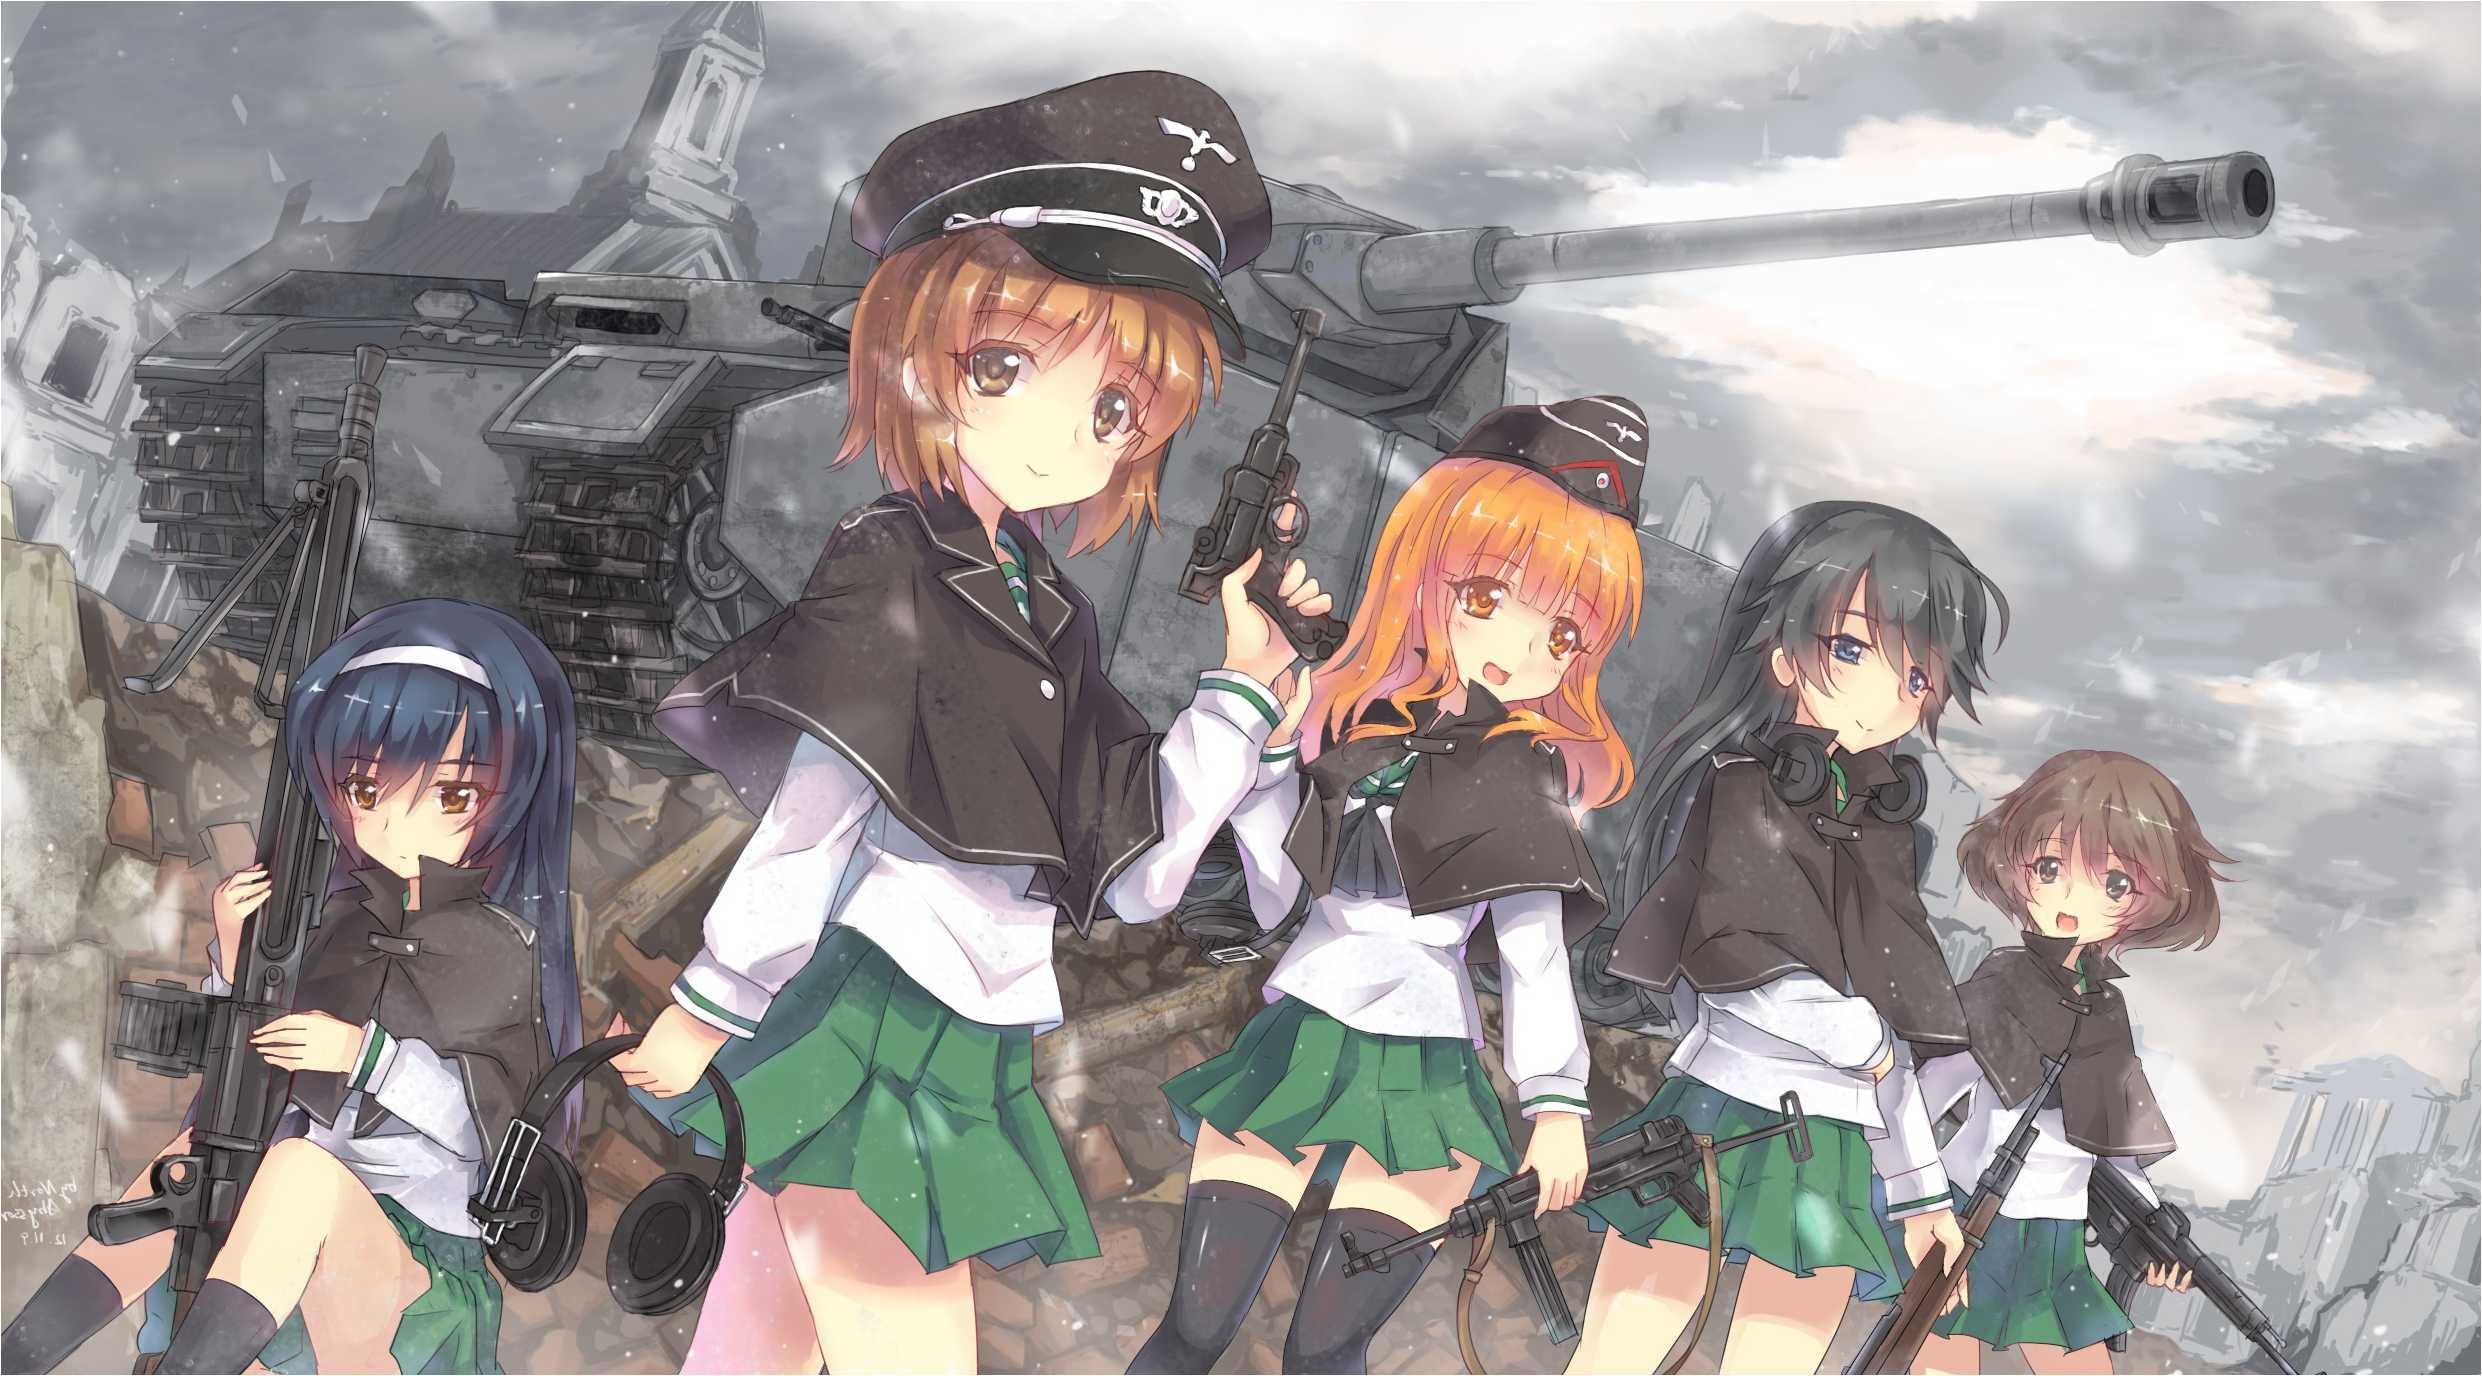 Download In Original Resolution - Girls And Panzer Wallpaper Hd , HD Wallpaper & Backgrounds